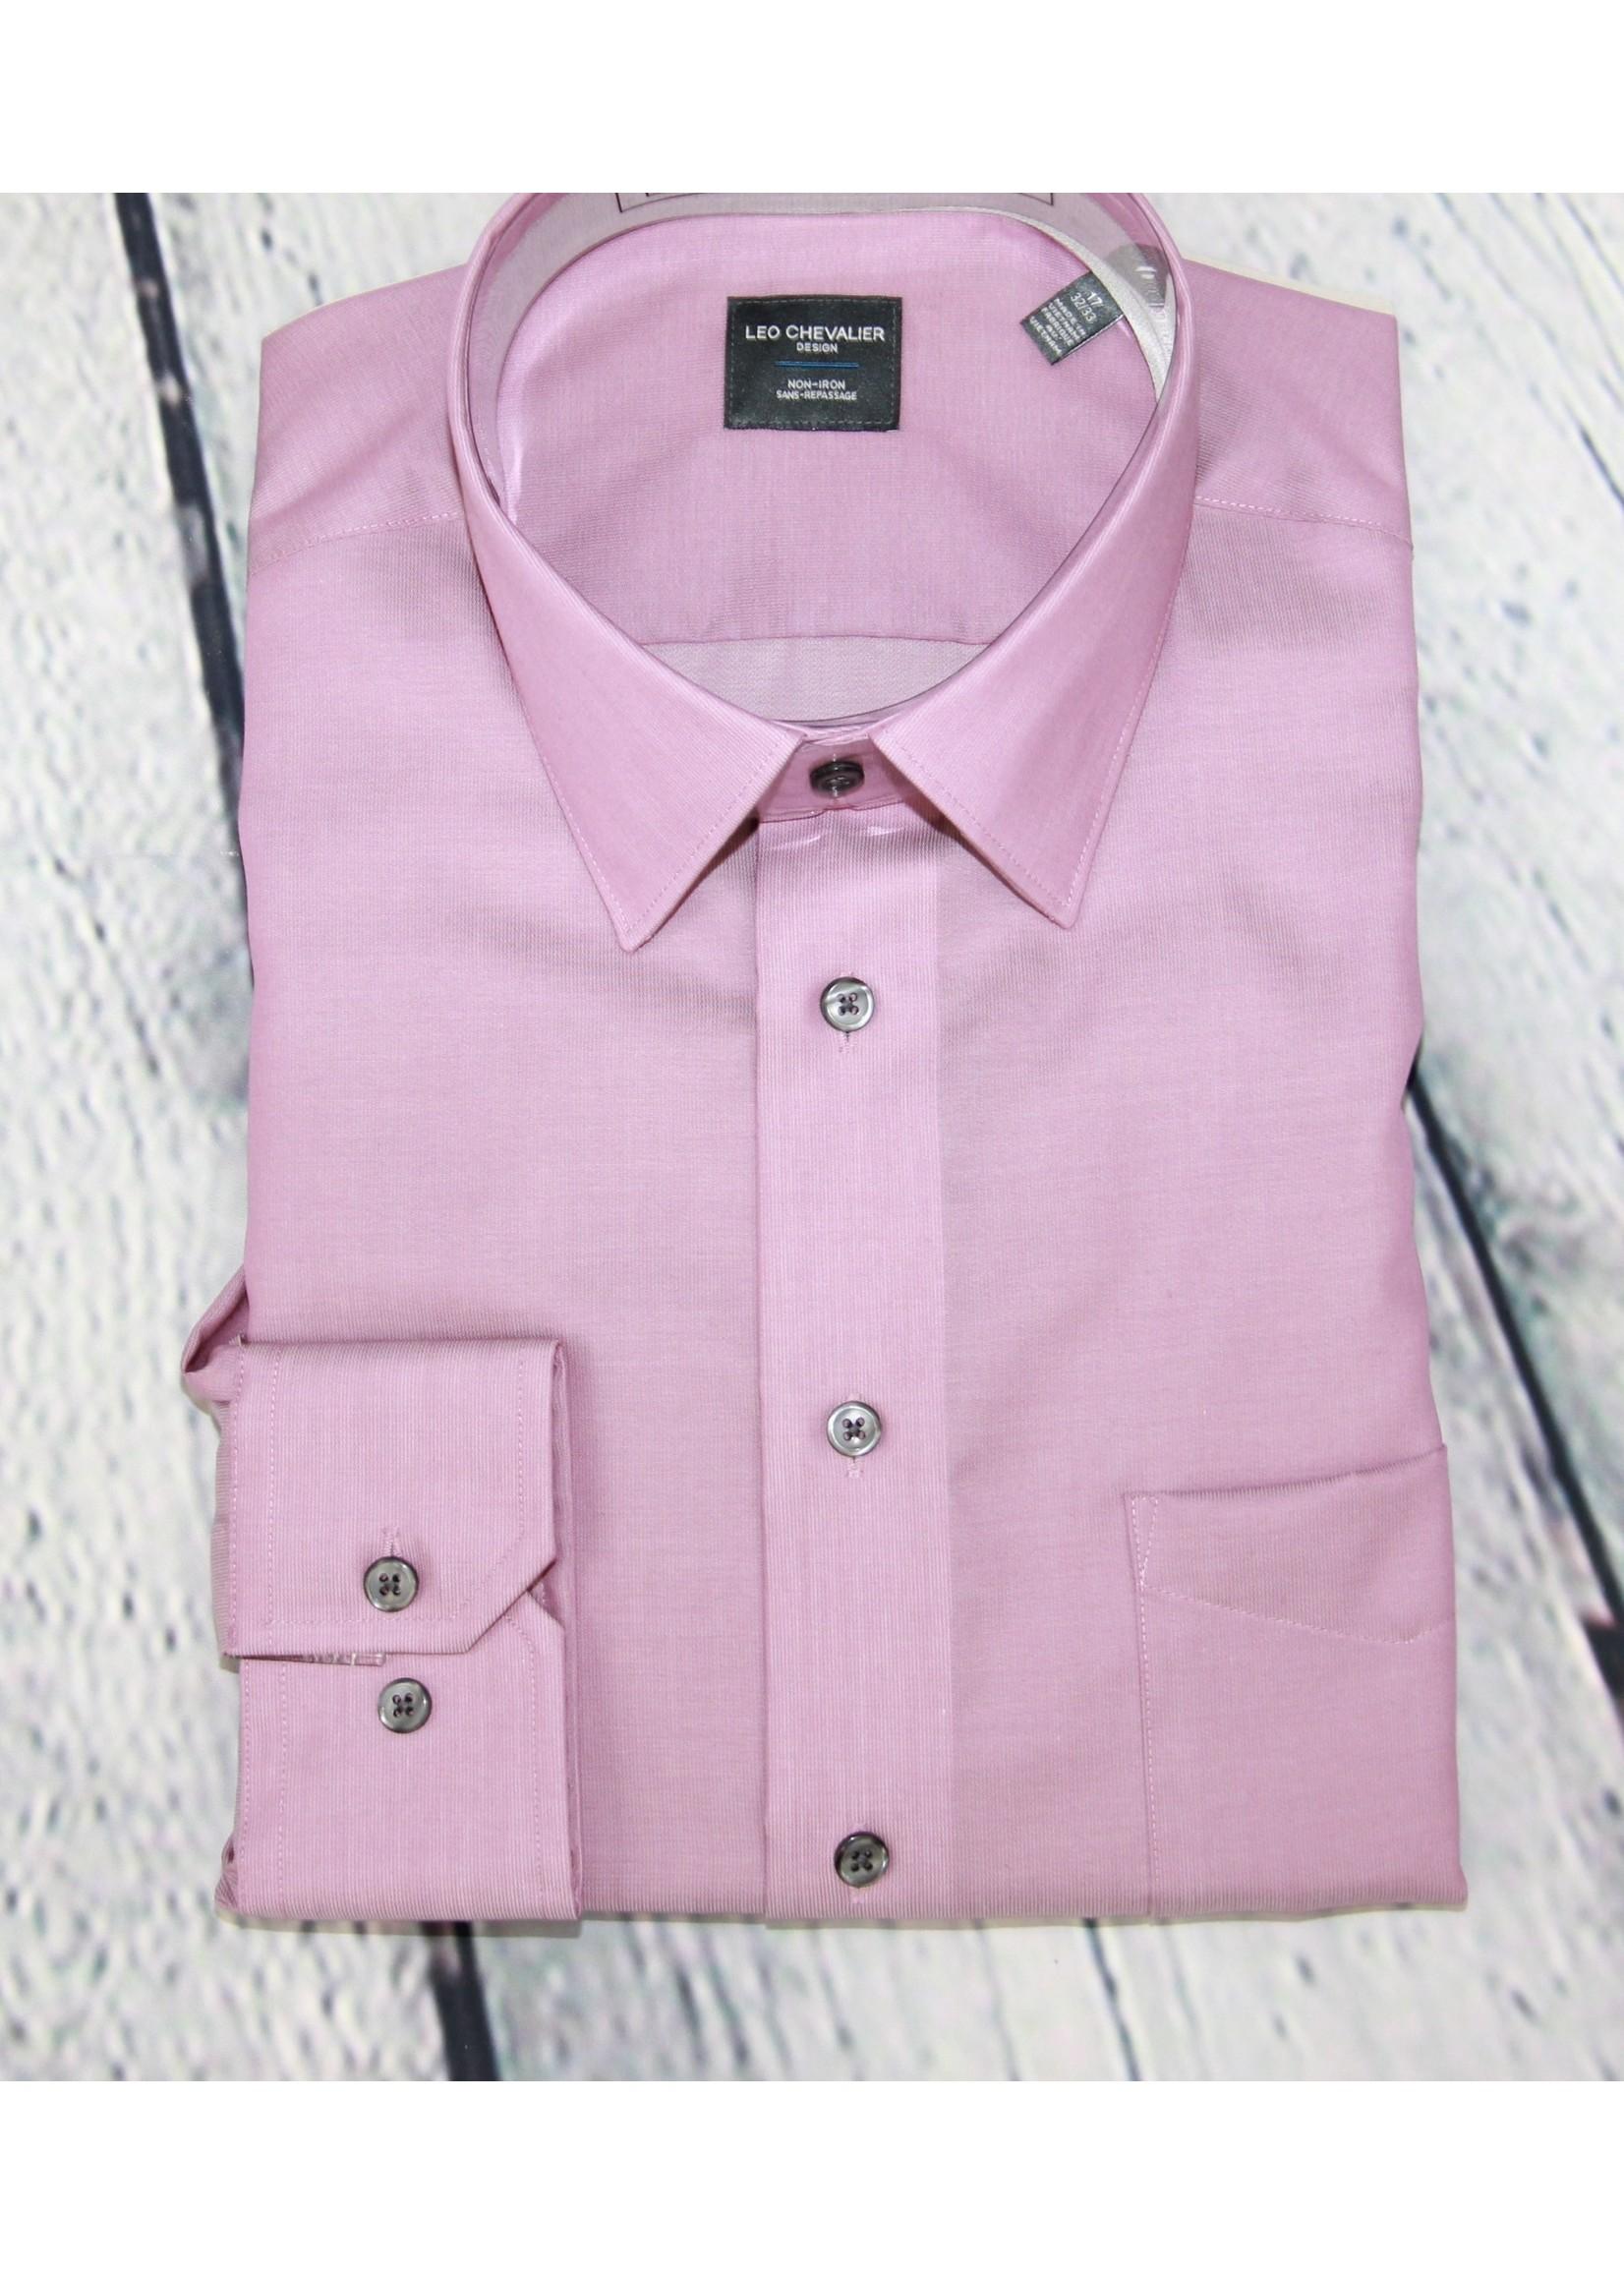 Leo Chevalier Long Sleeve Casual Shirt